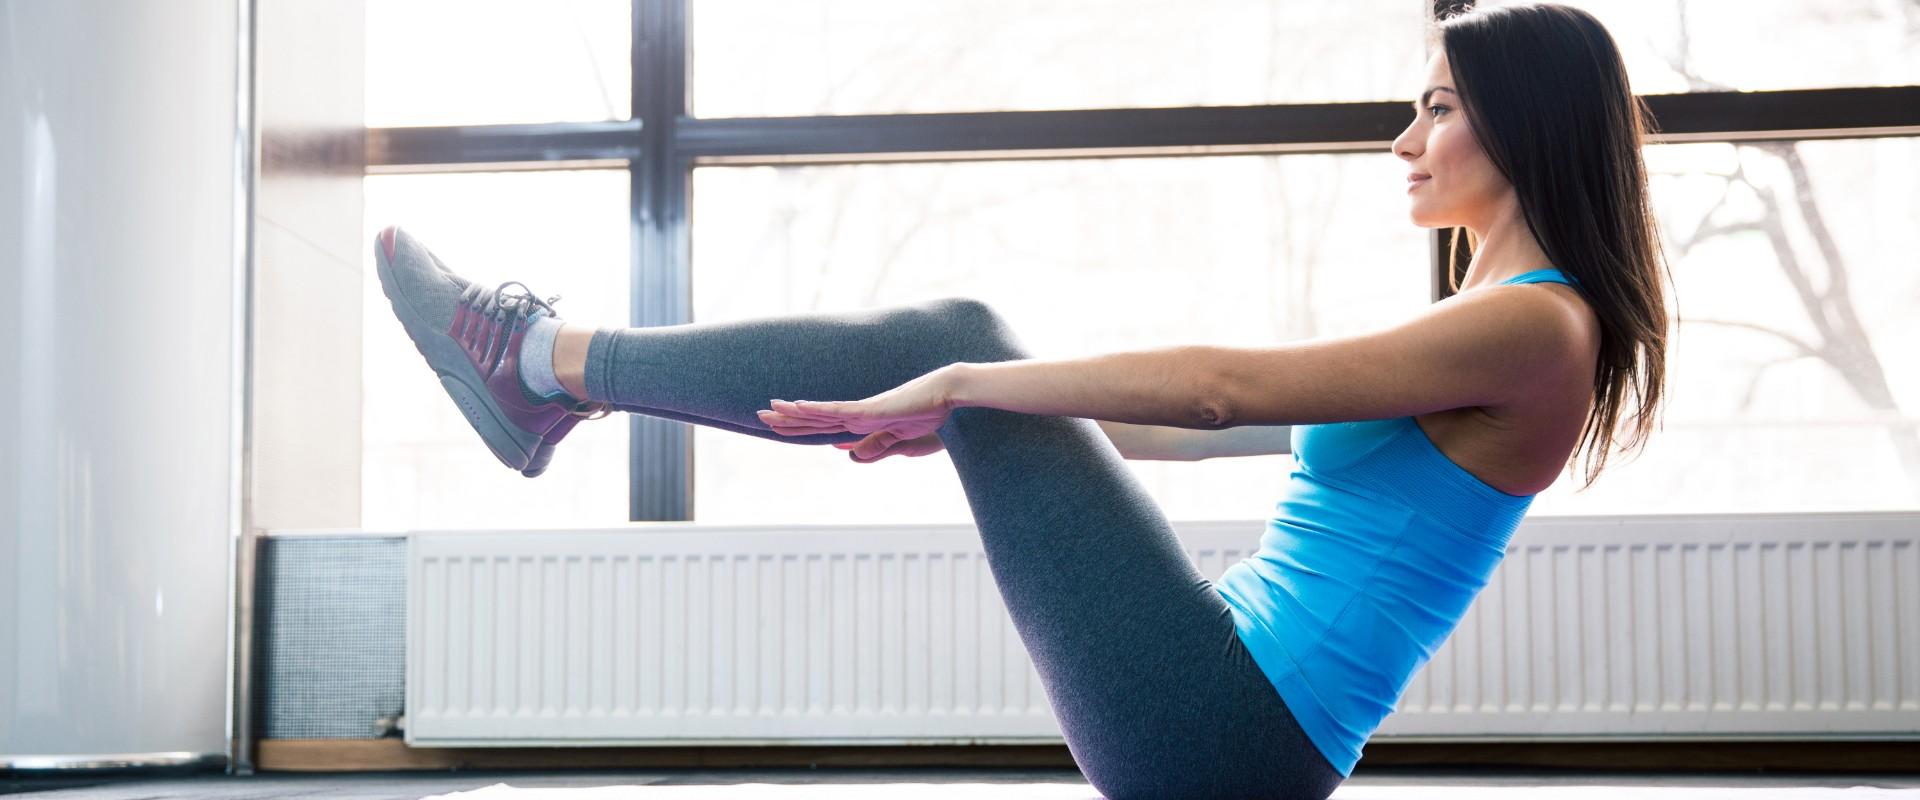 5 eficaces ejercicios para incorporar a tu rutina con AB Tomic